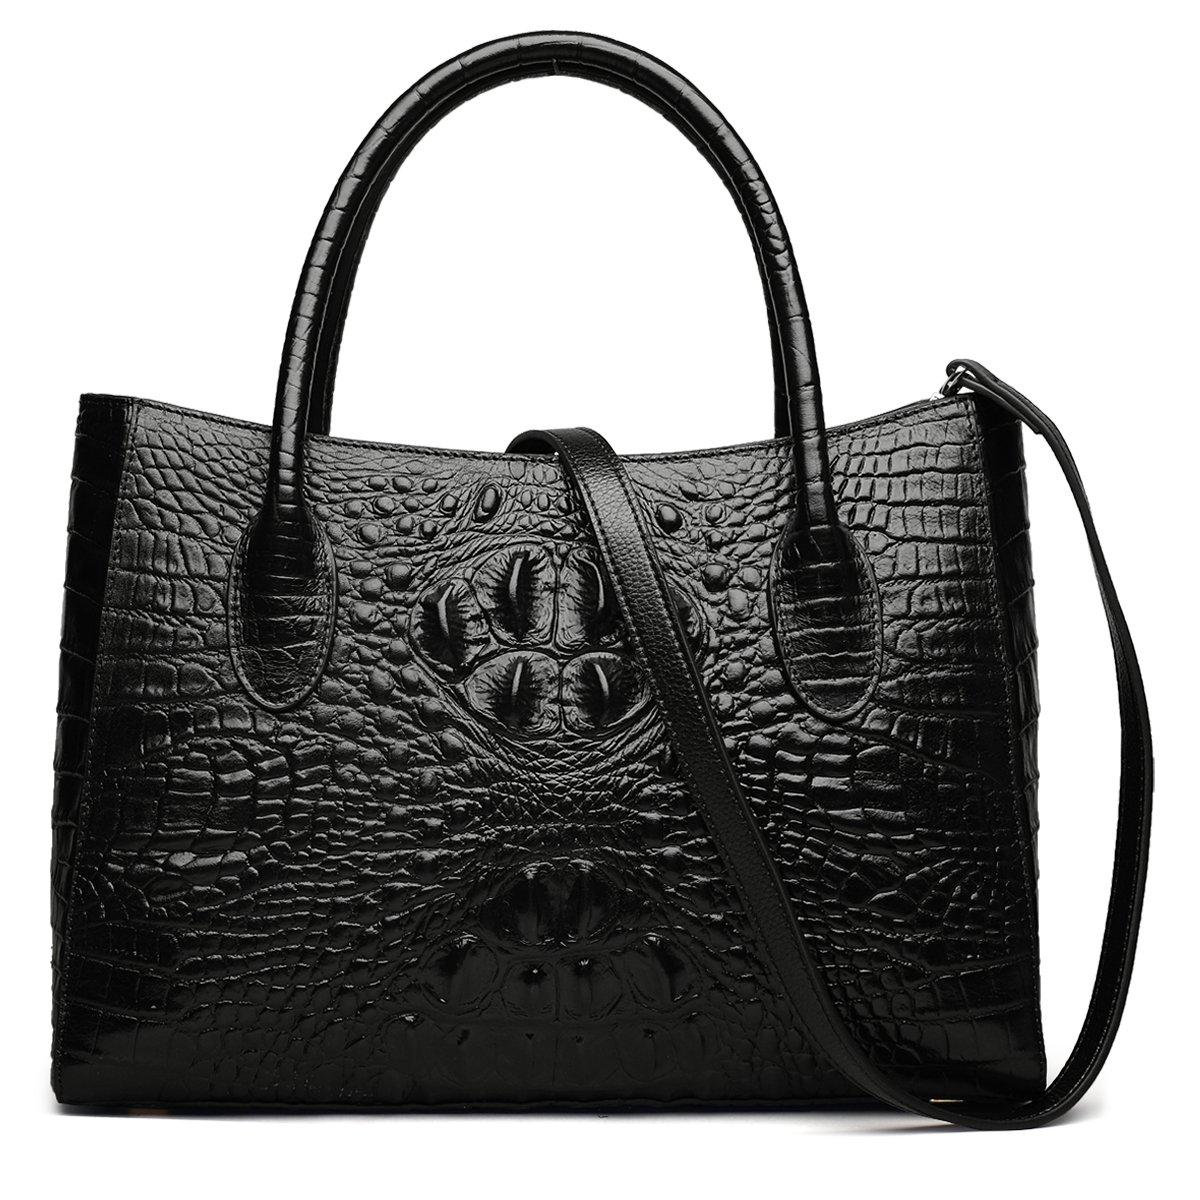 Black ZOOLER Genuine Leather Handbag Purses for Women Crocodile Embrossed